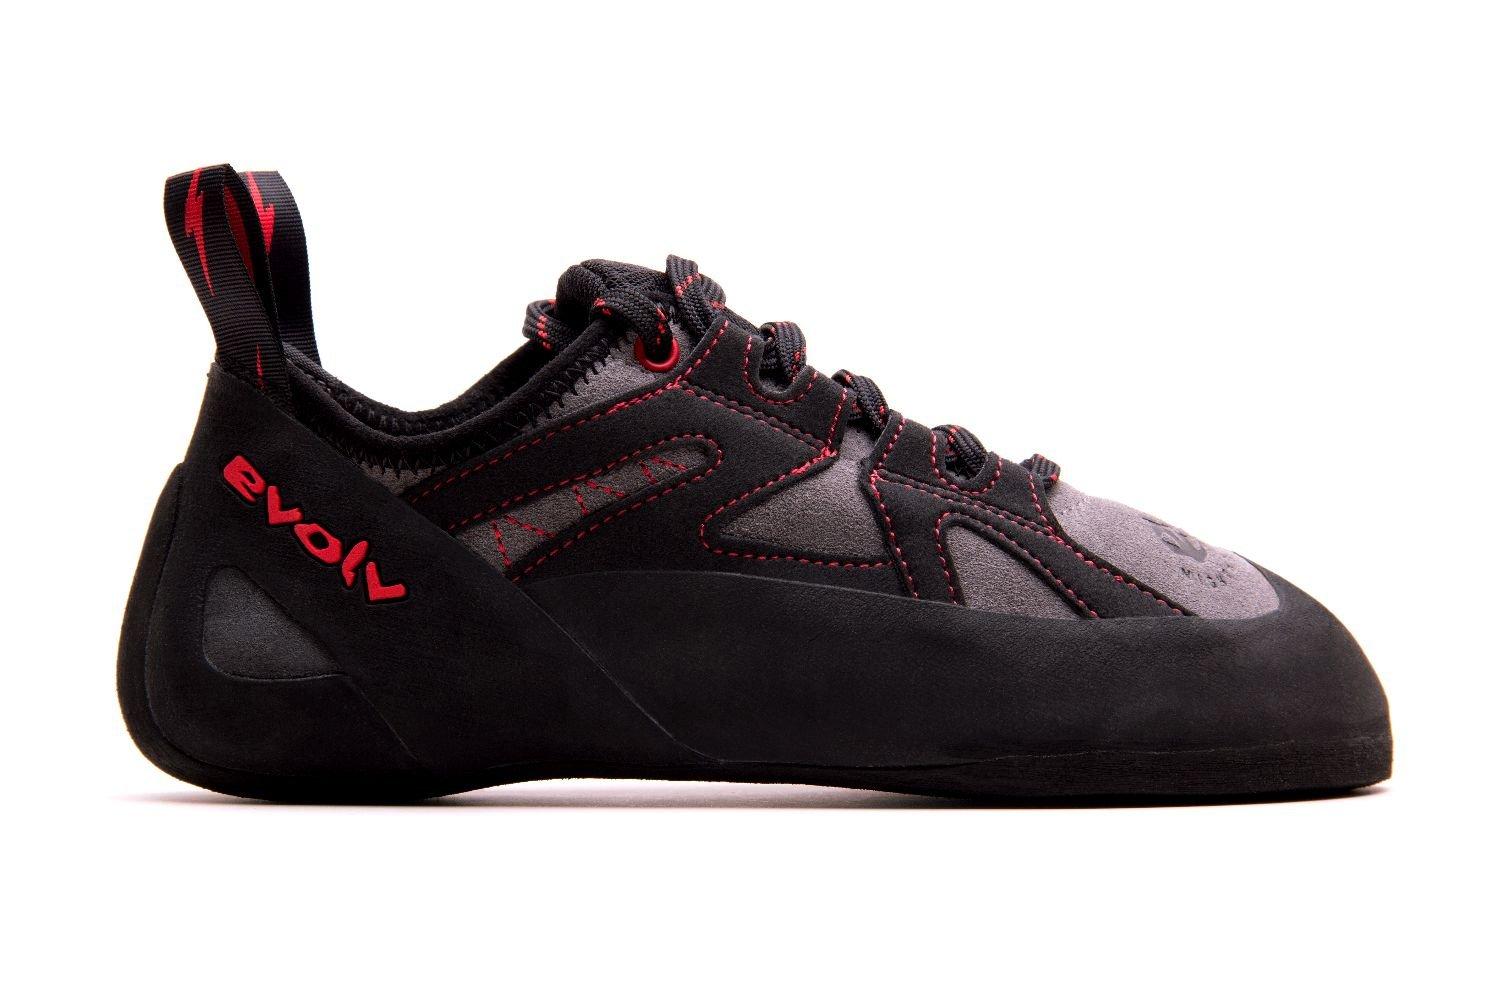 Evolv Nighthawk Climbing Shoe - Men's Gray/Black 10 by Evolv